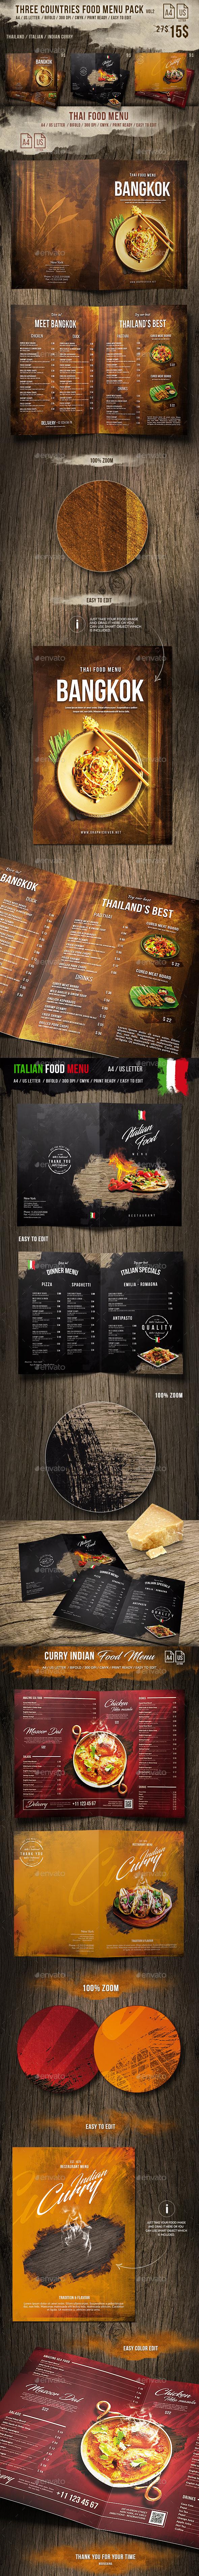 Three Countries Menu Pack vol-2 - A4 and US Letter - Food Menus Print Templates